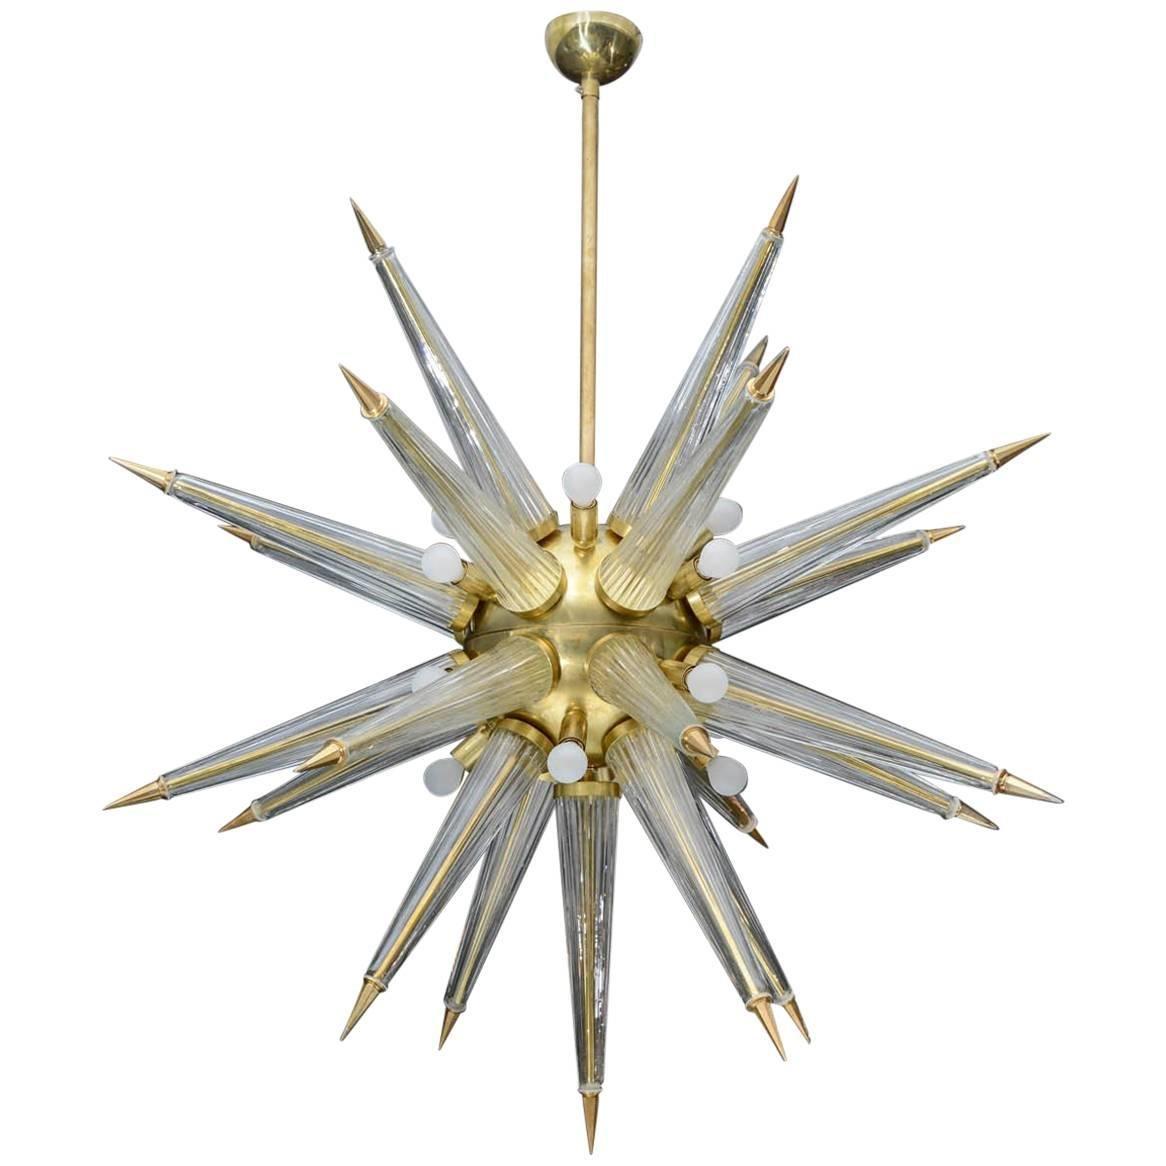 Messing Sputnik Kronleuchter mit Murano Glas Spitzen, 1970er